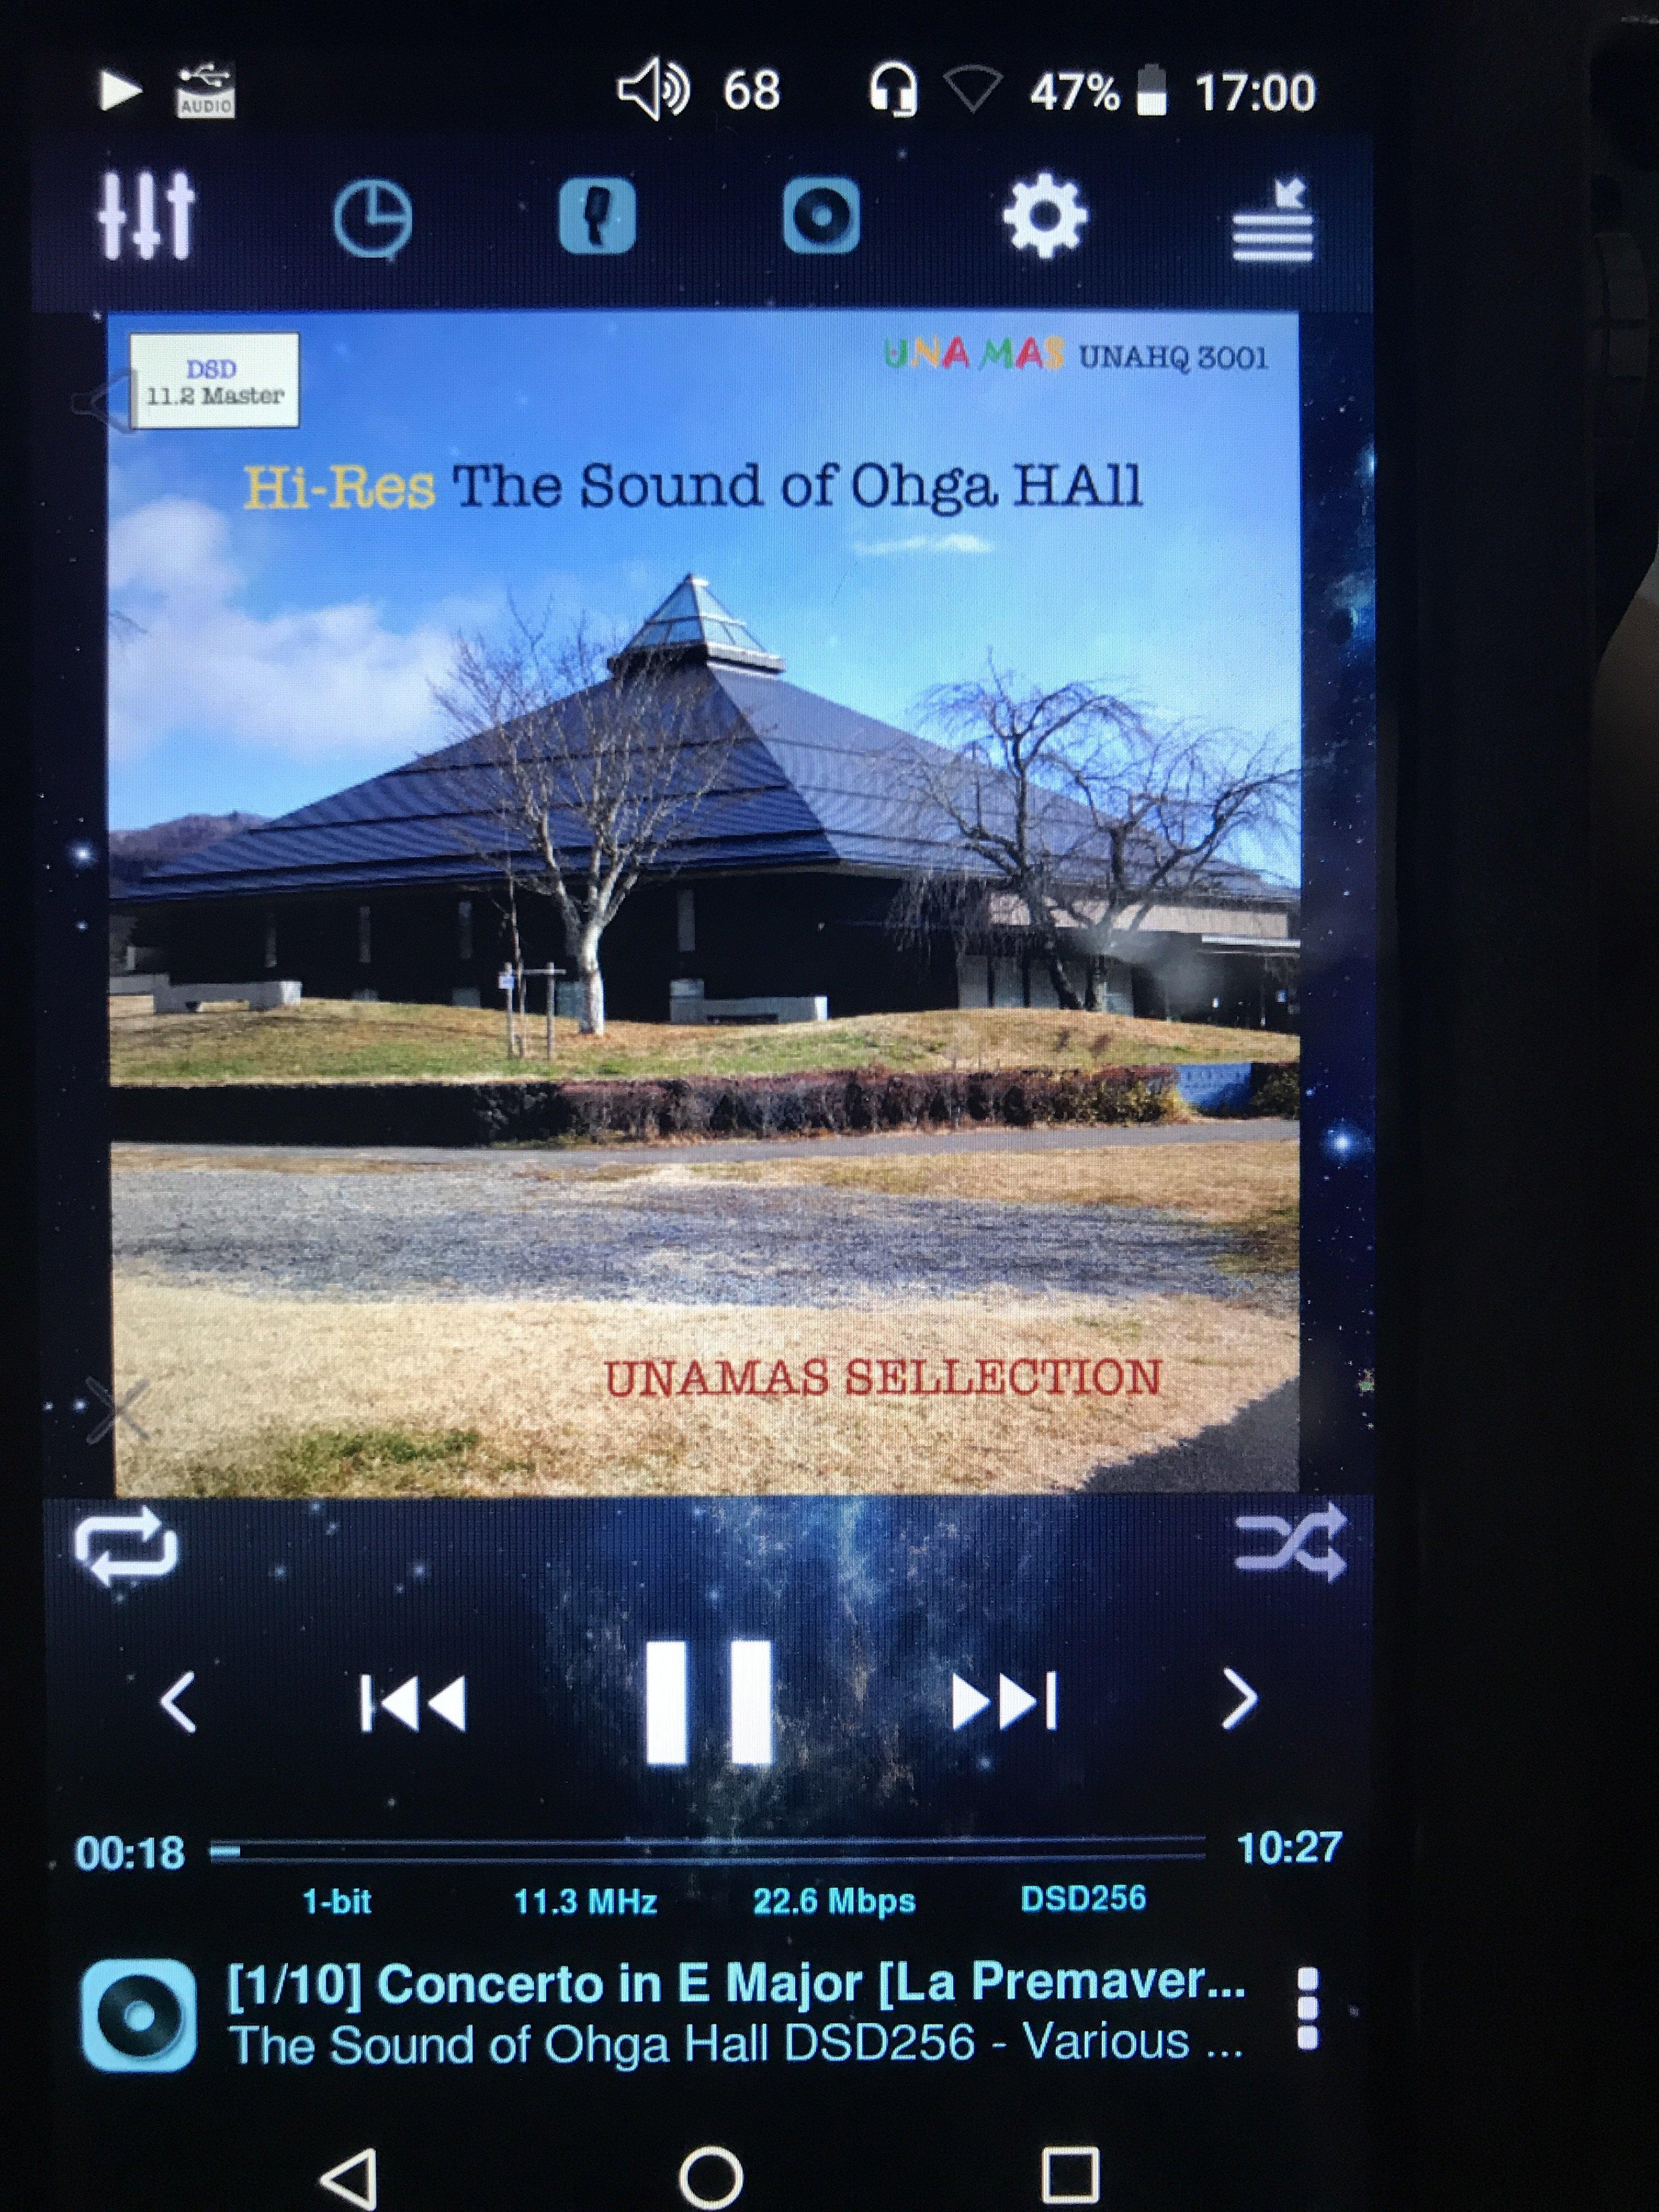 DX200=Affordable High End Audio  Dual ES9028Pro dacs  AMP1, AMP3